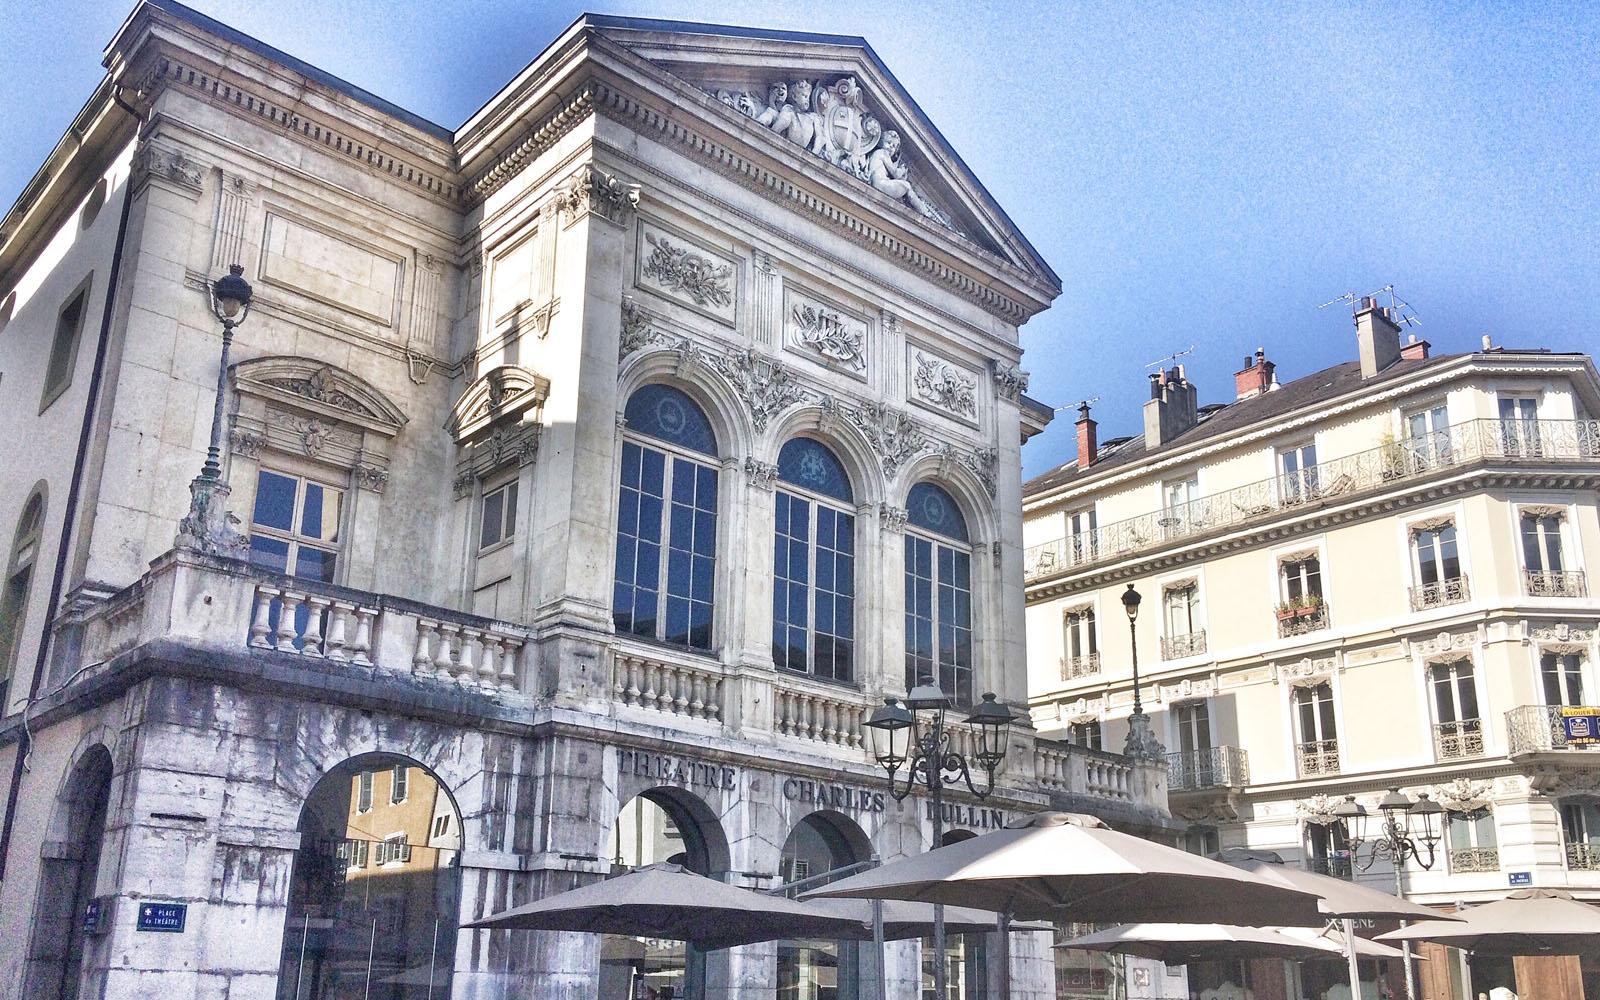 Il teatro Charles Dullin di Chambéry. © oltreilbalcone